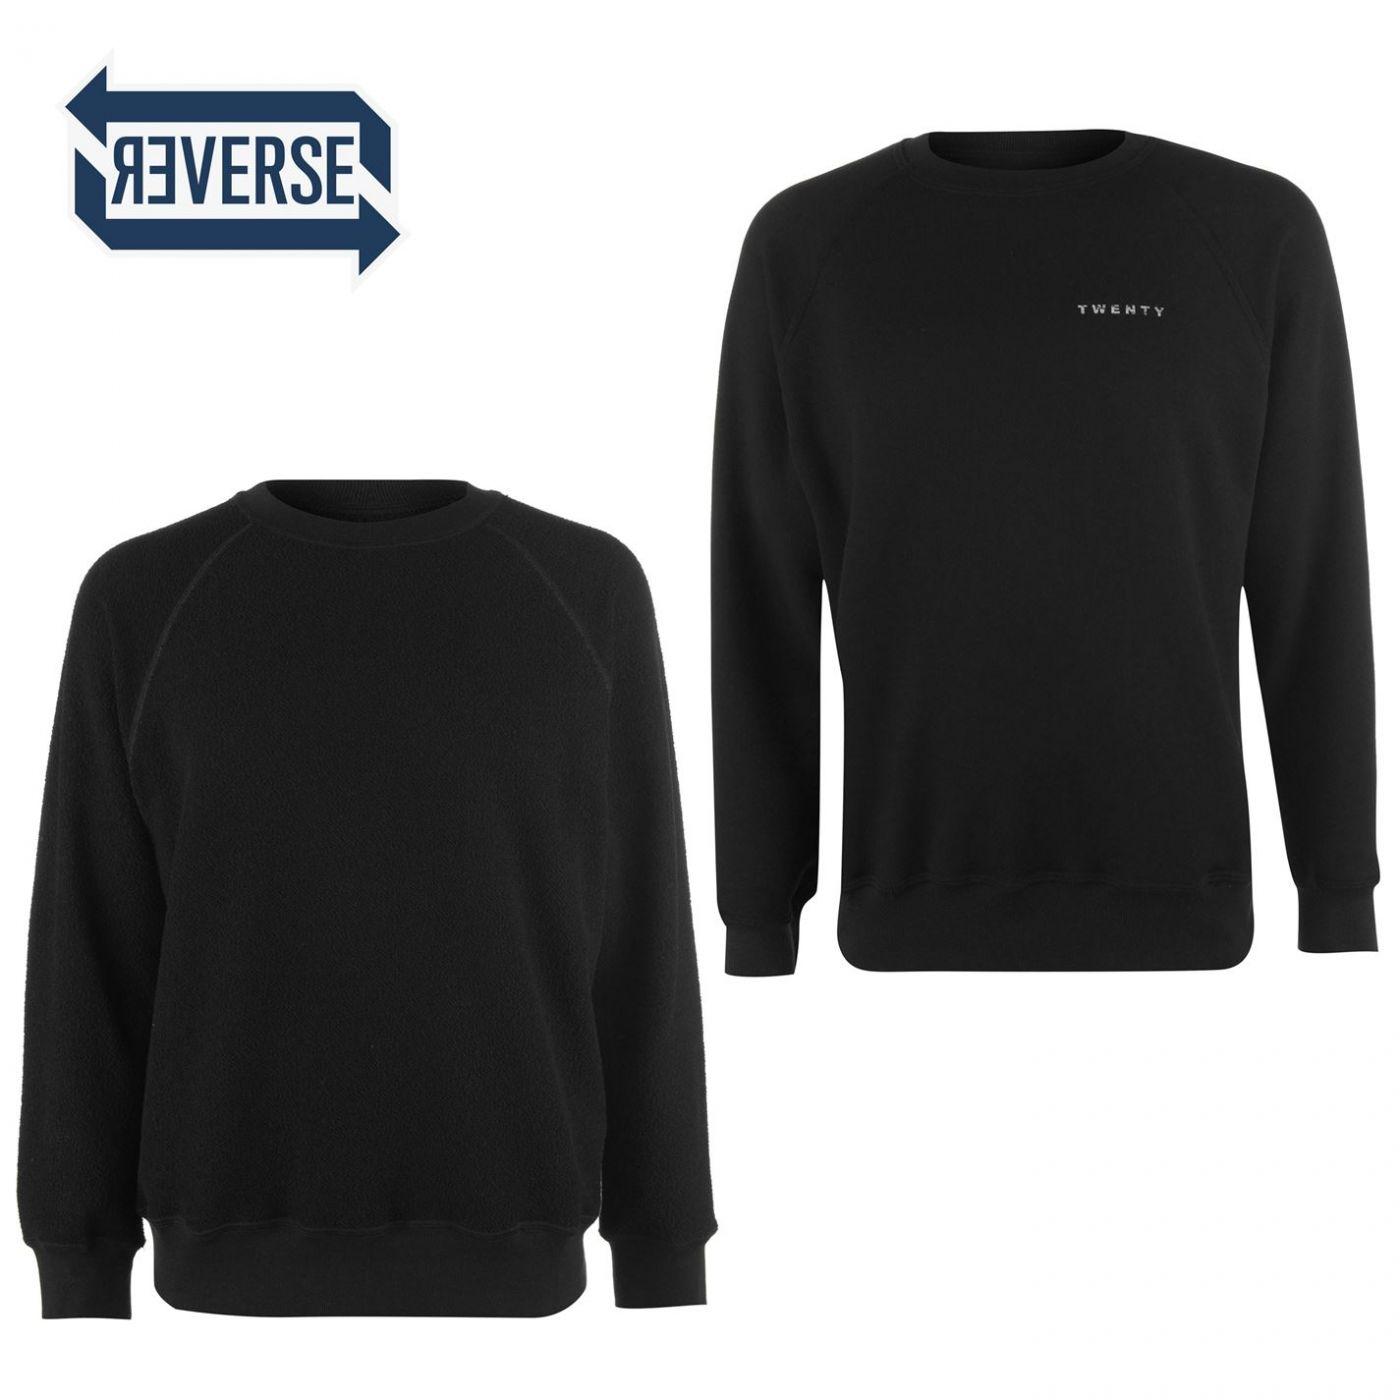 TWENTY Reverse Sweater